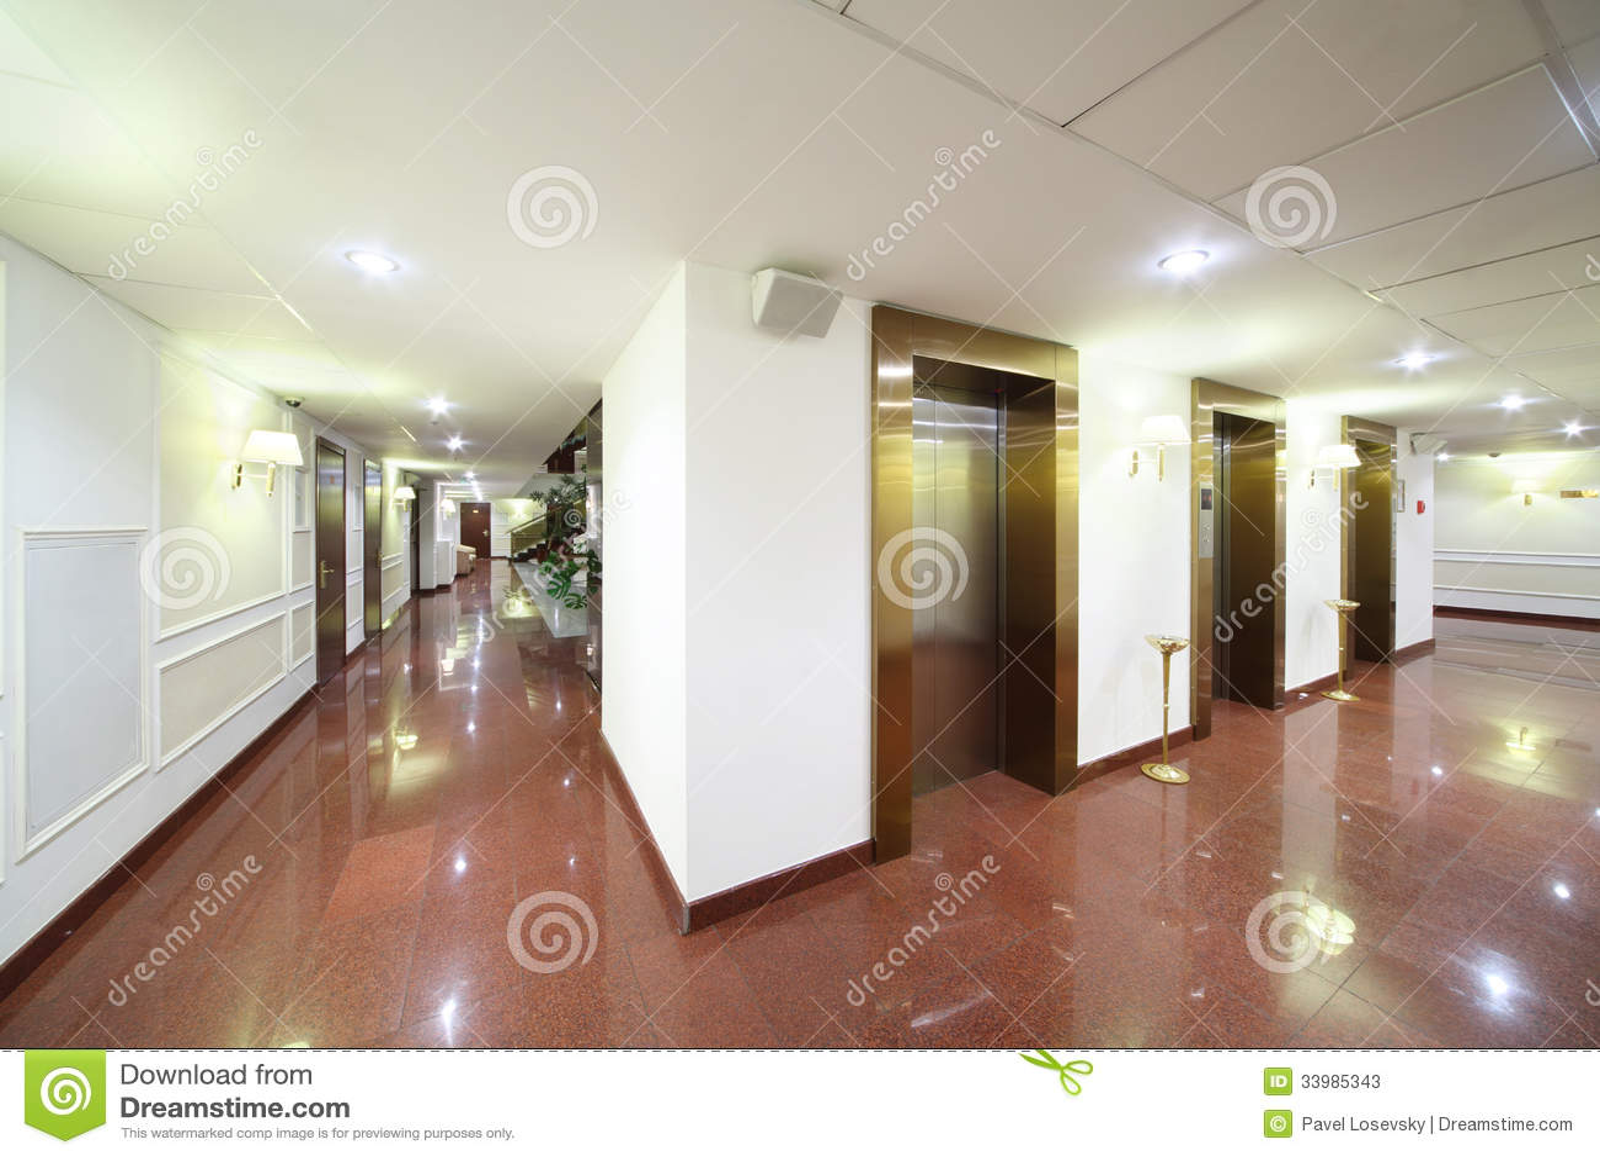 Download Entrances To Elevators And Marble Floor Stock Illustration - Illustration of design, architecture: 33985343